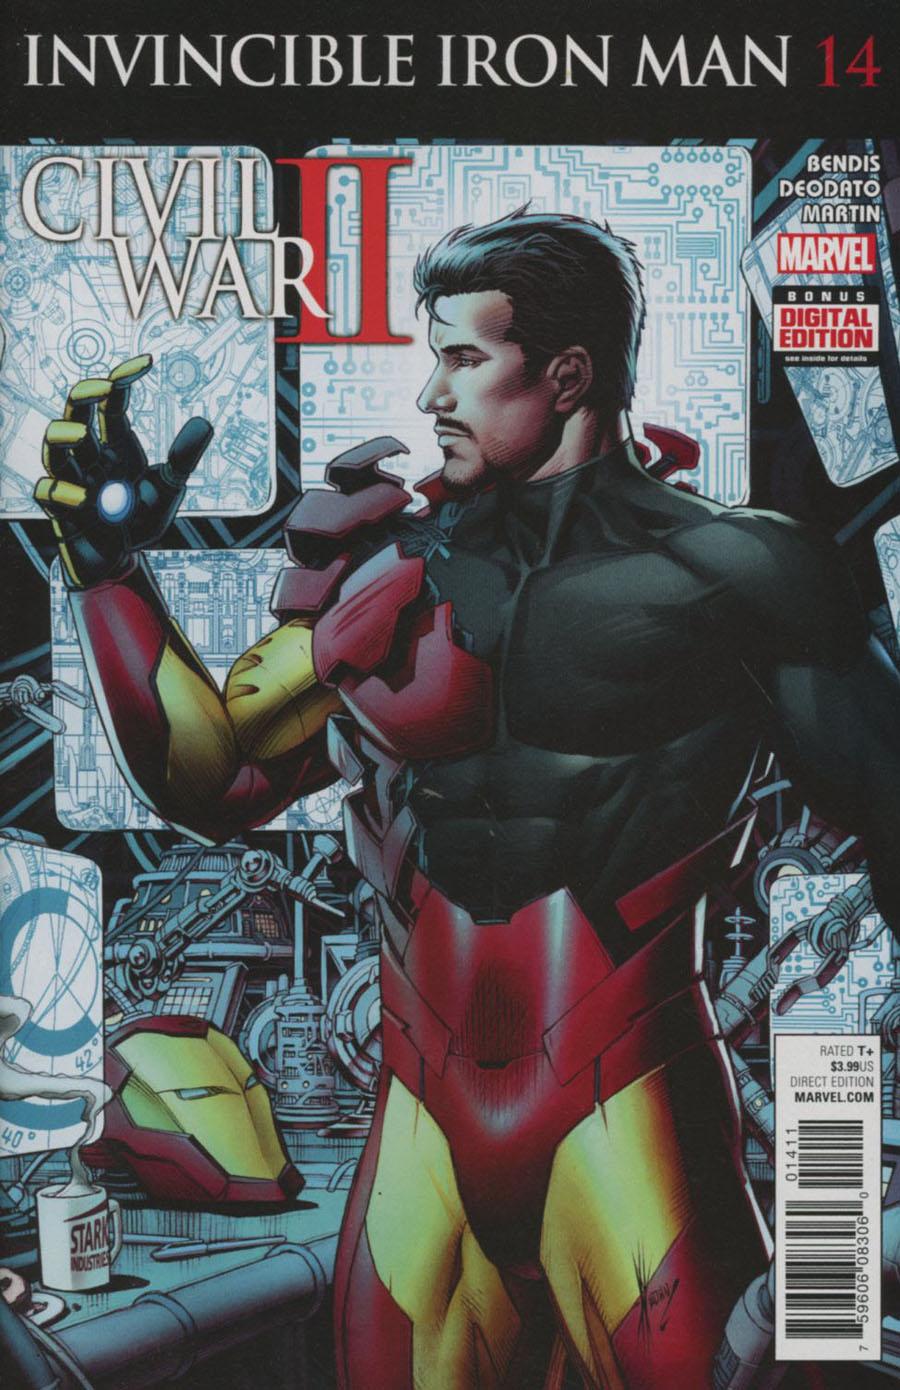 Invincible Iron Man Vol 2 #14 Cover A 1st Ptg (Civil War II Tie-In)